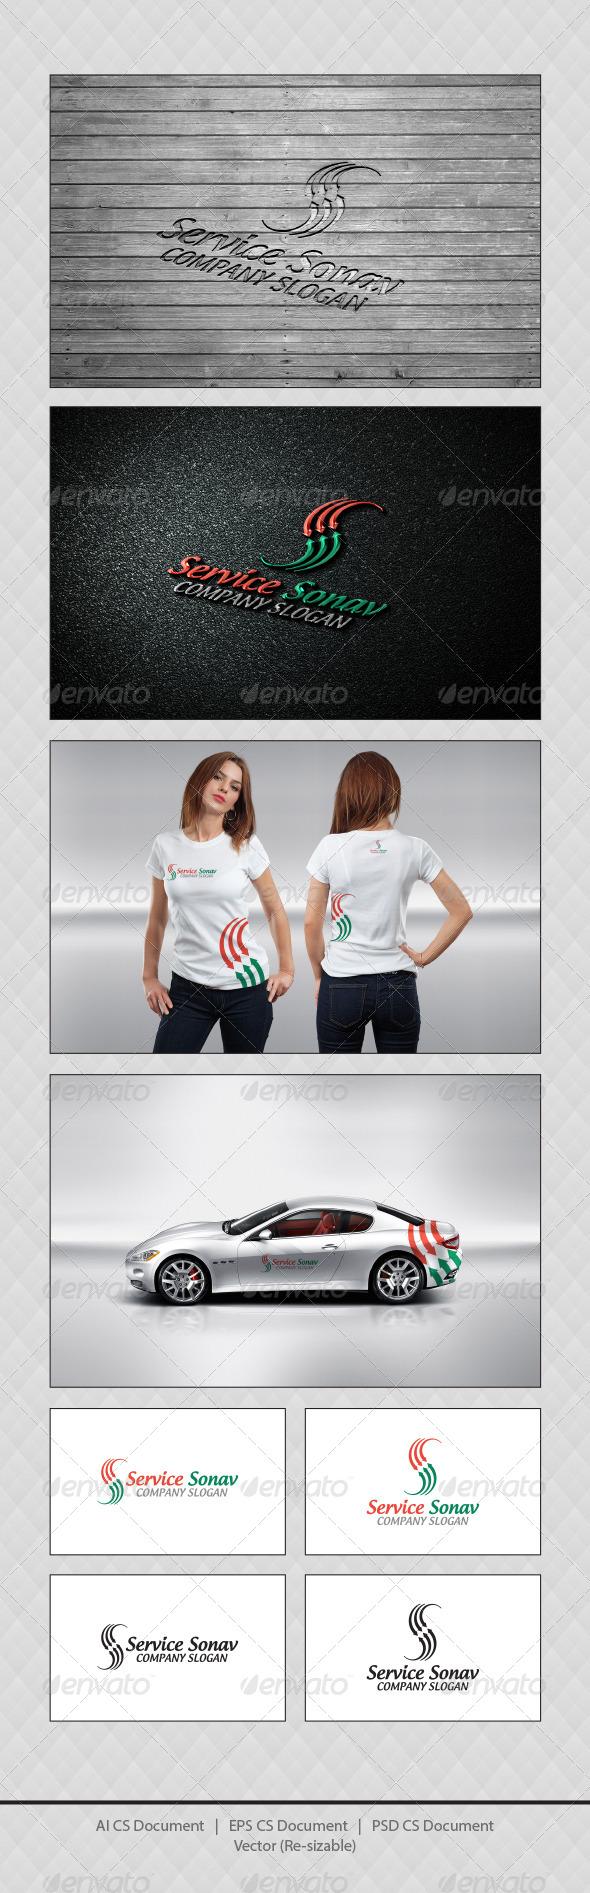 GraphicRiver Service Sonav S Logo Templates 4726995